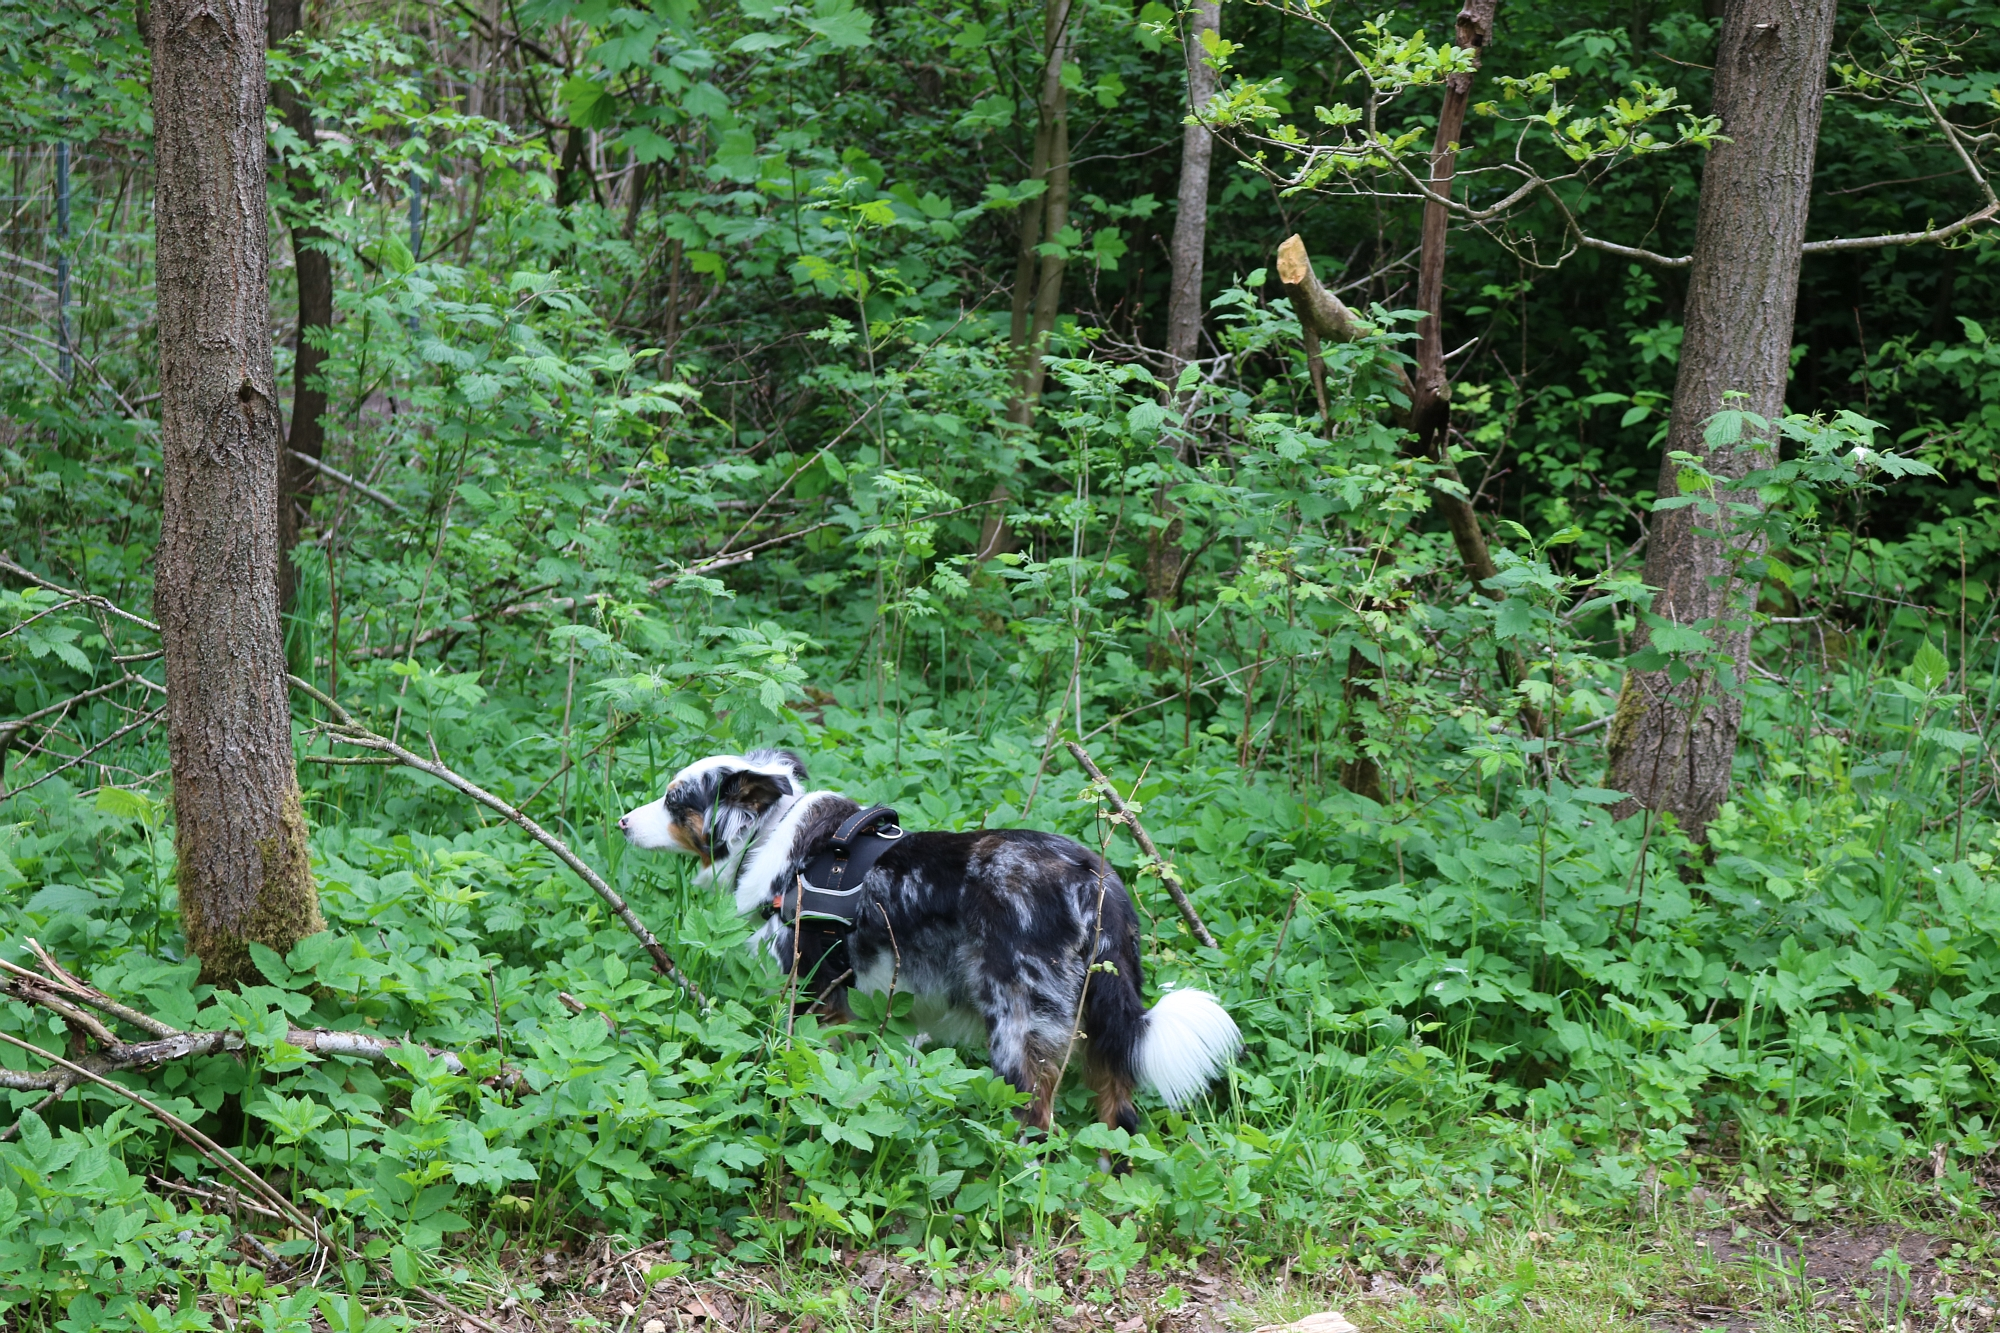 20200522 Hundefreilauf Sylter Weg 1